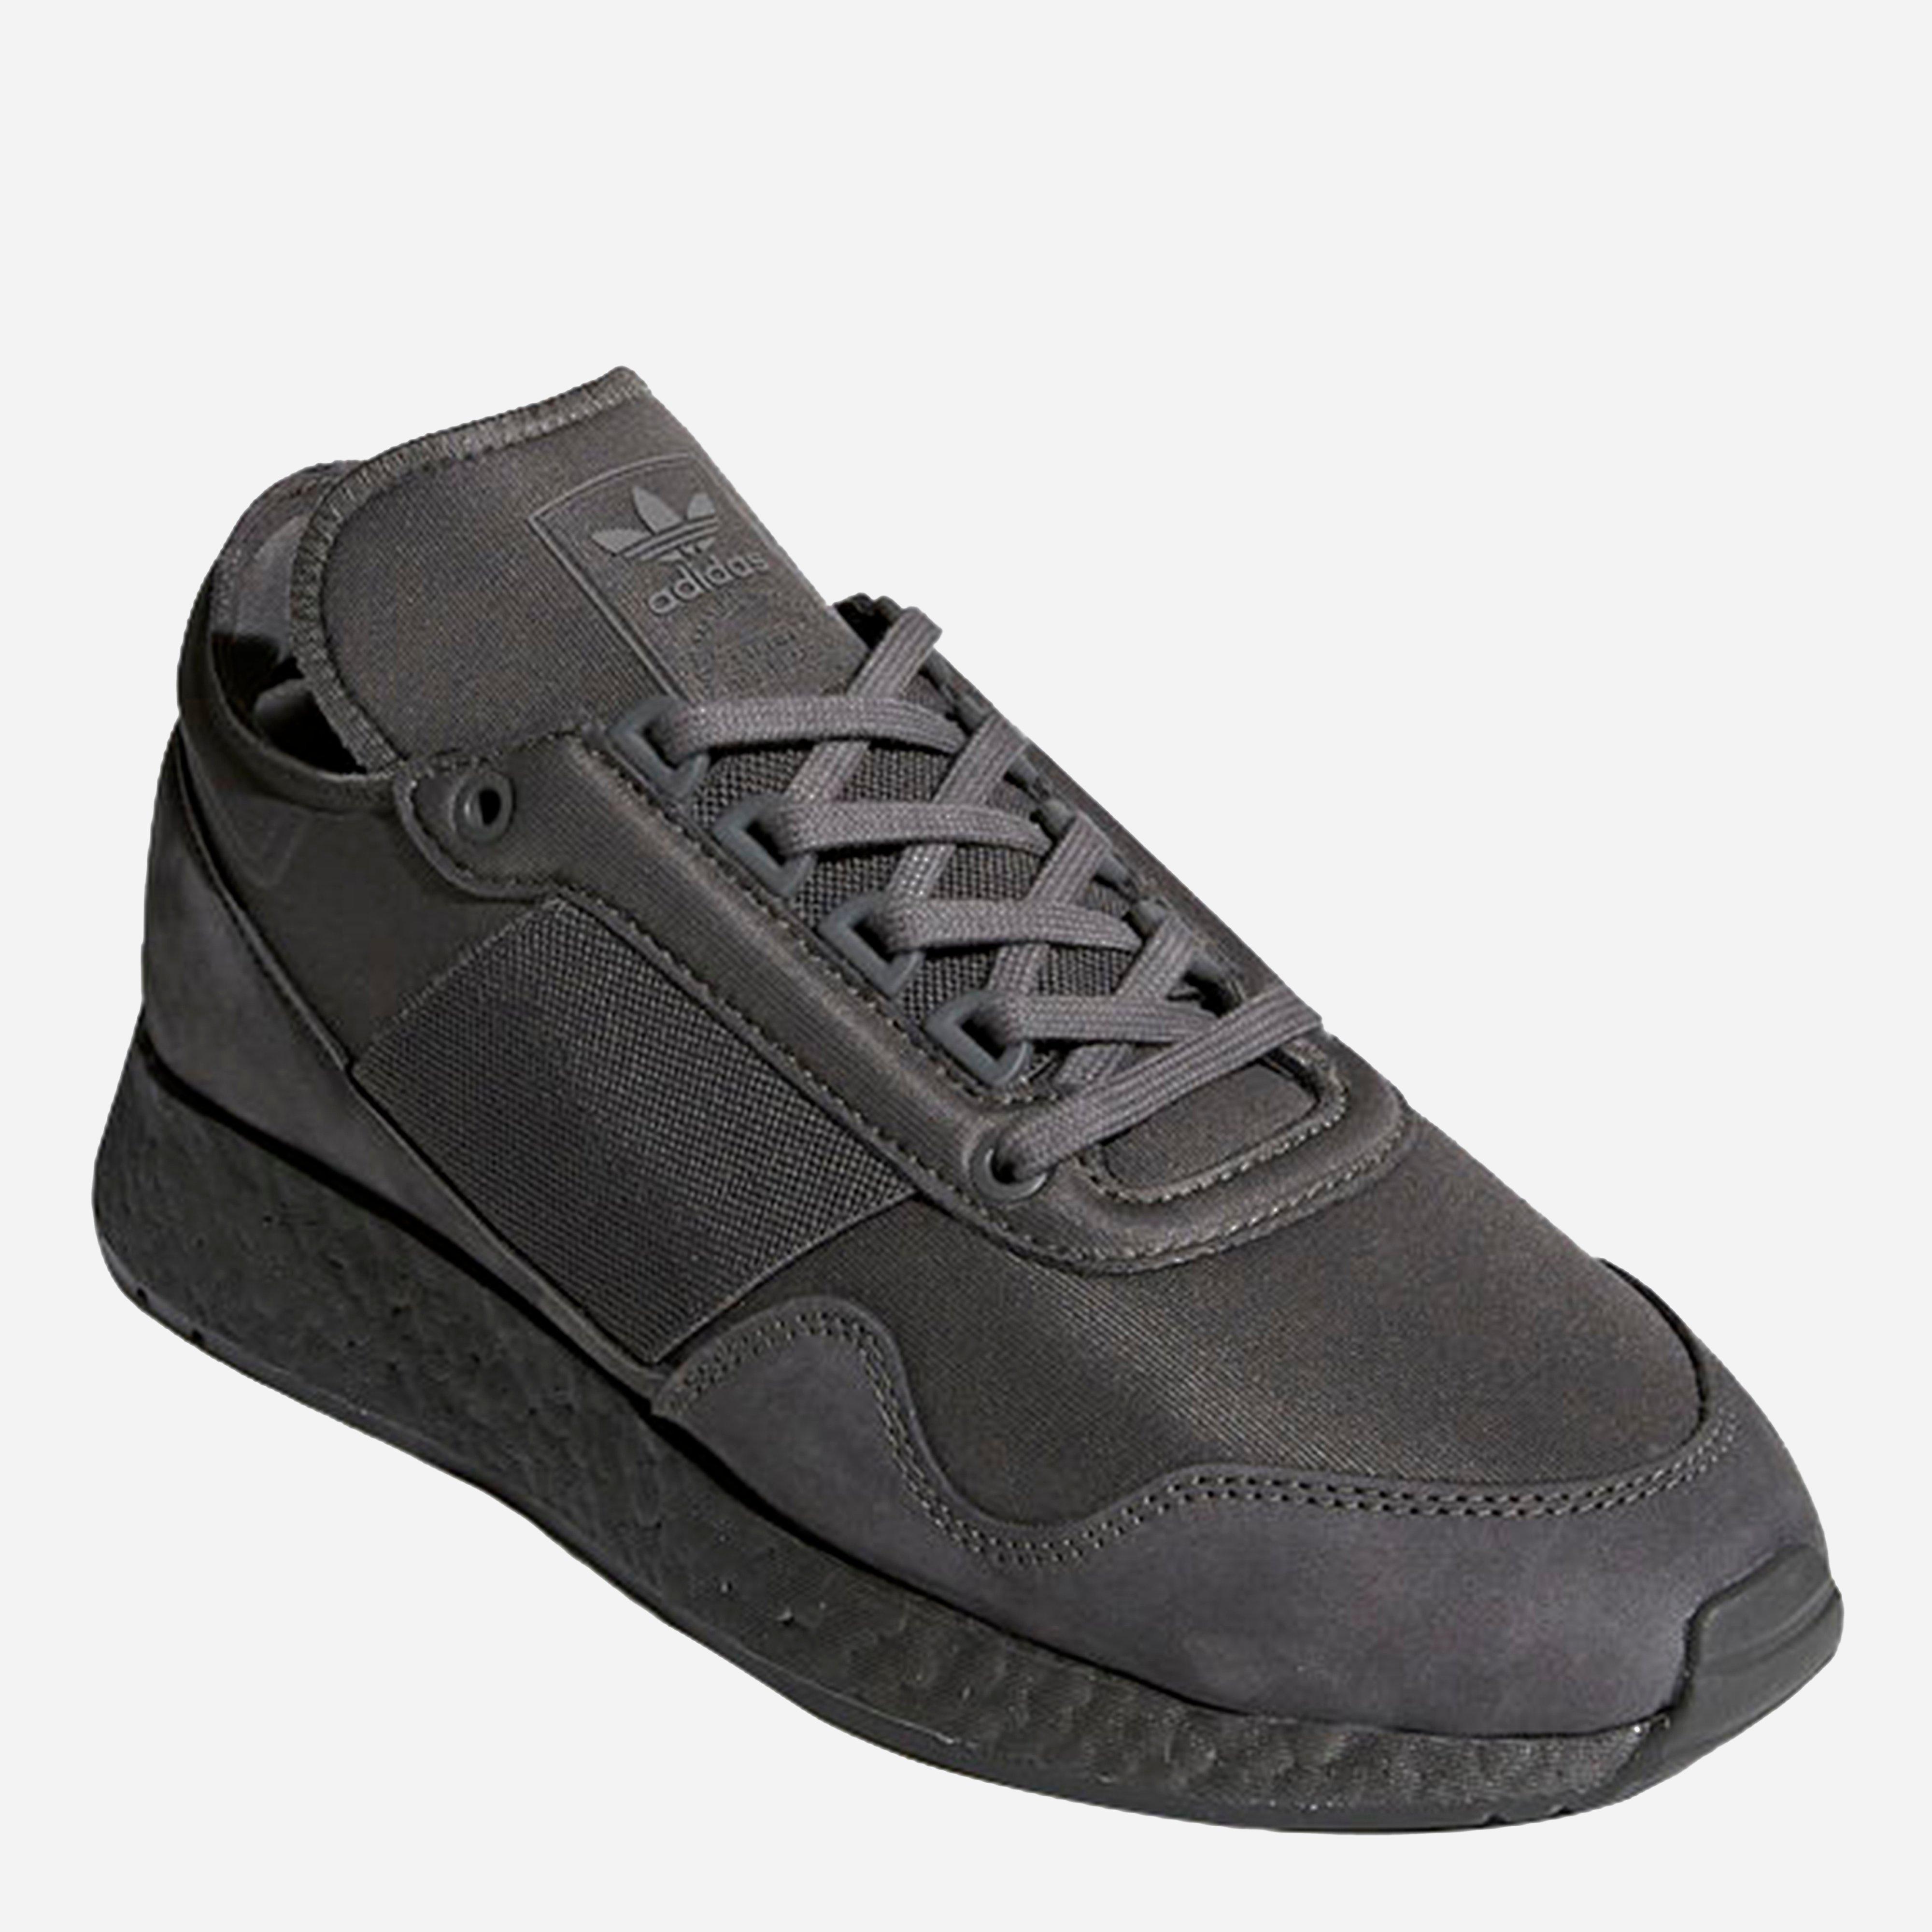 new concept c1126 f8bcc Adidas Originals X Daniel Arsham New York in Gray for Men -